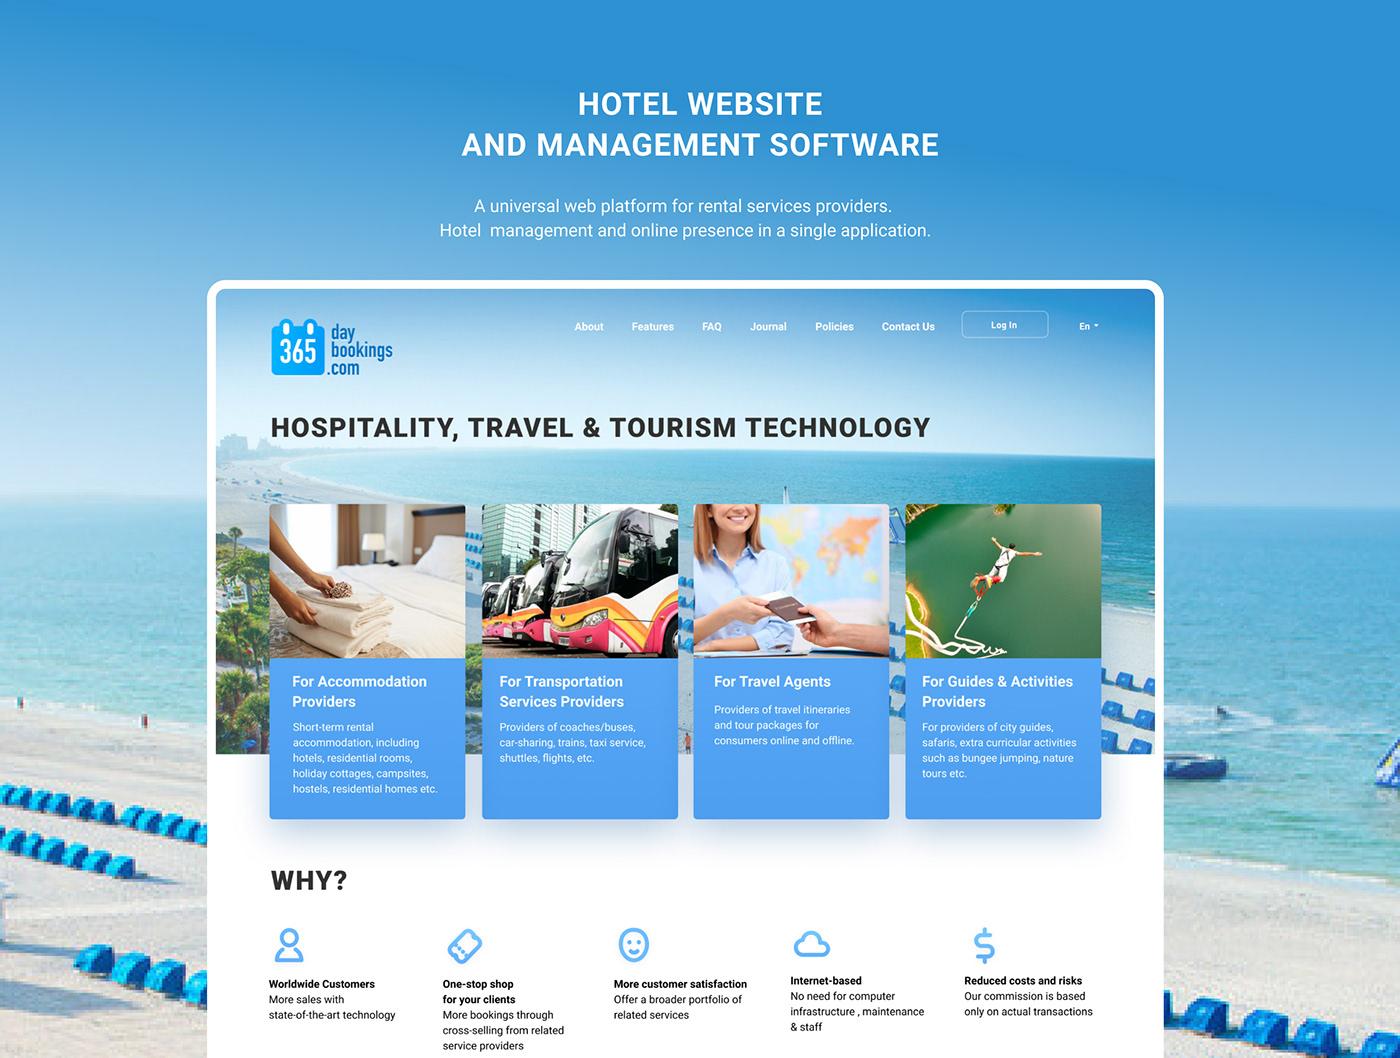 Hotel website and management software